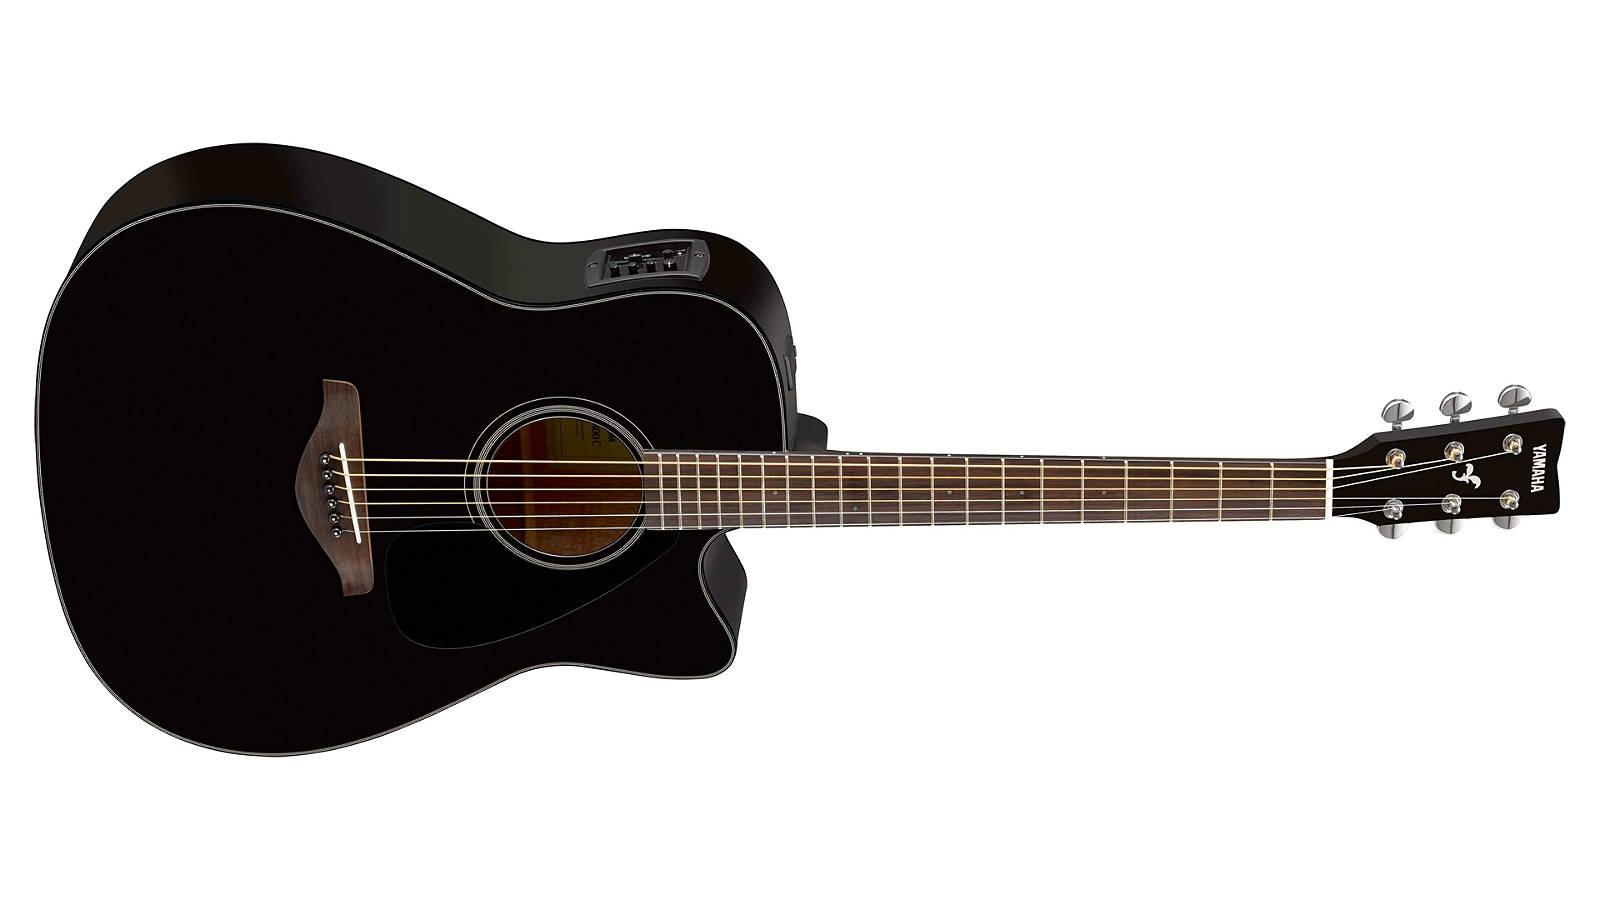 Yamaha FGX800C BL Westerngitarre Black